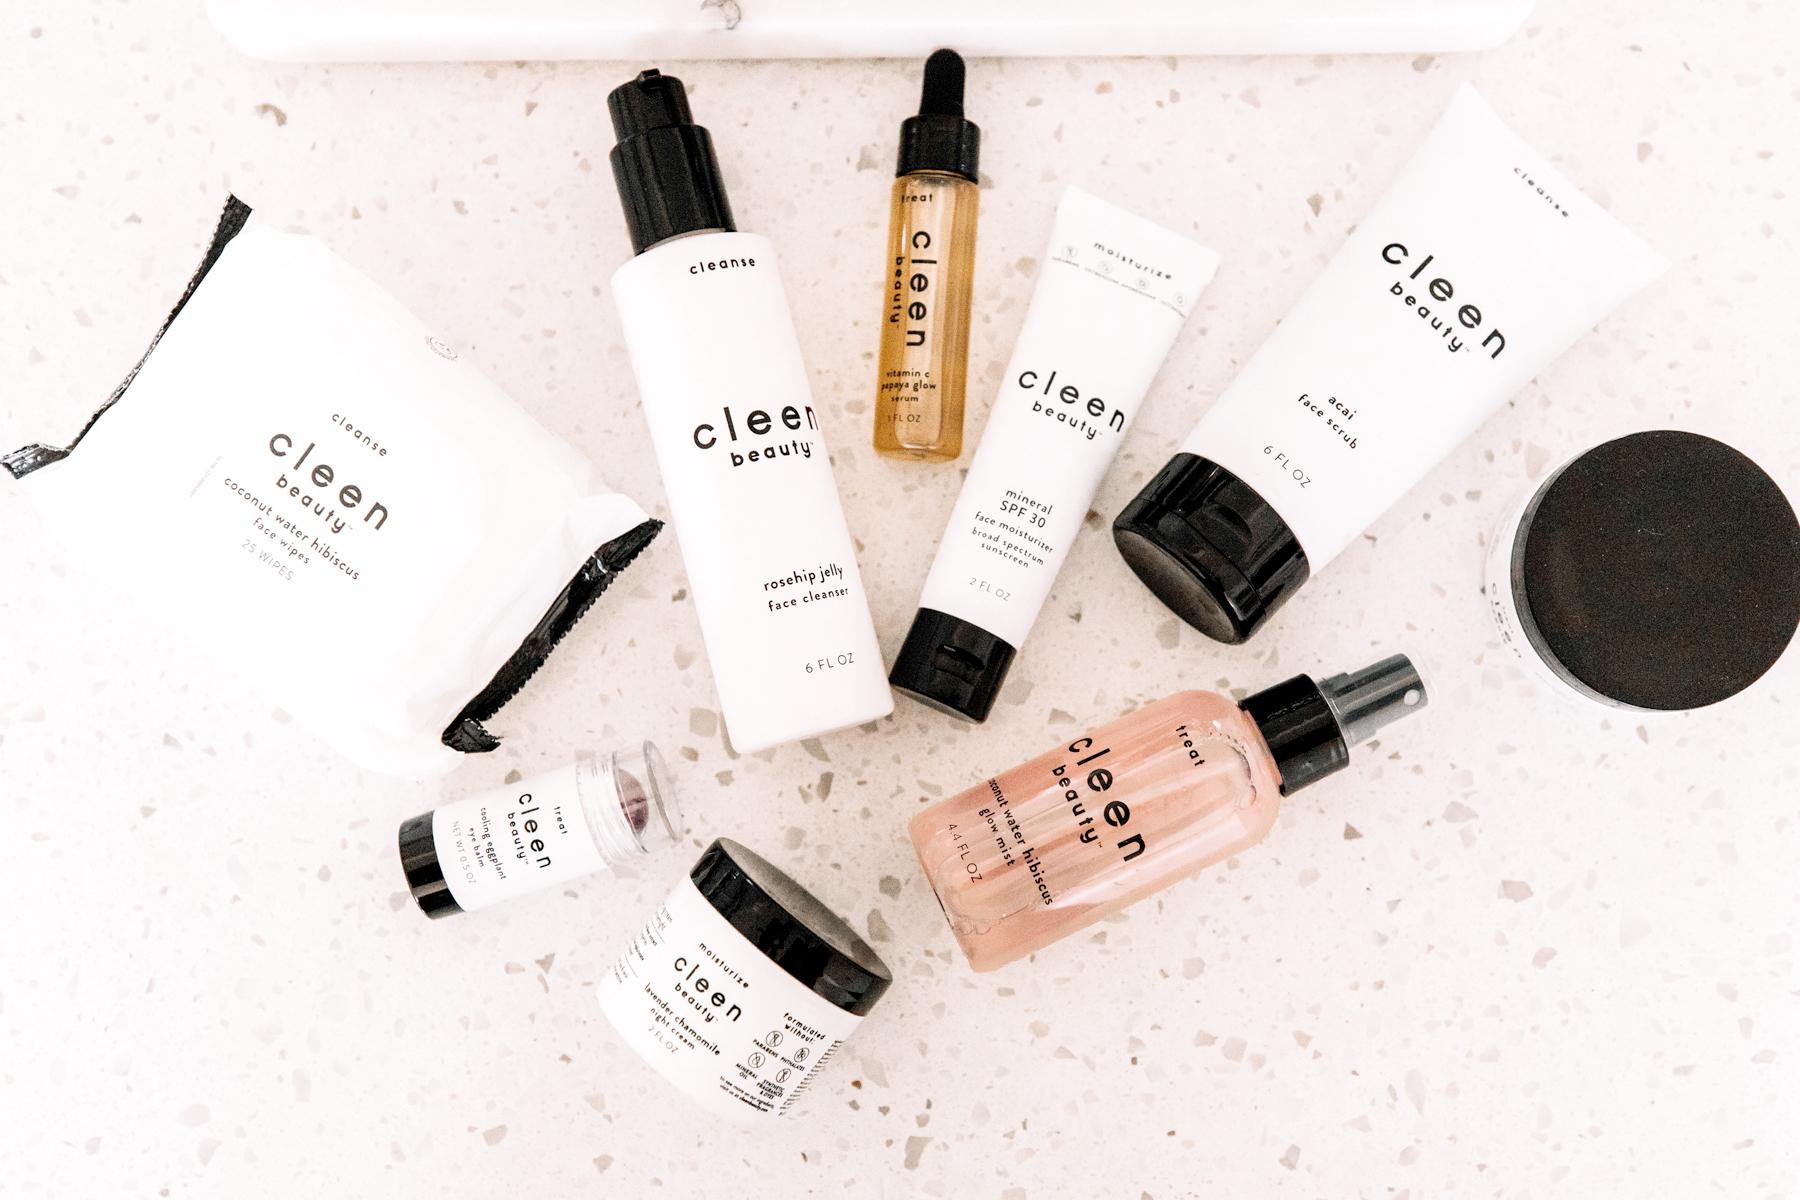 Fashion Jackson Walmart Beauty Cleen Beauty Products 1